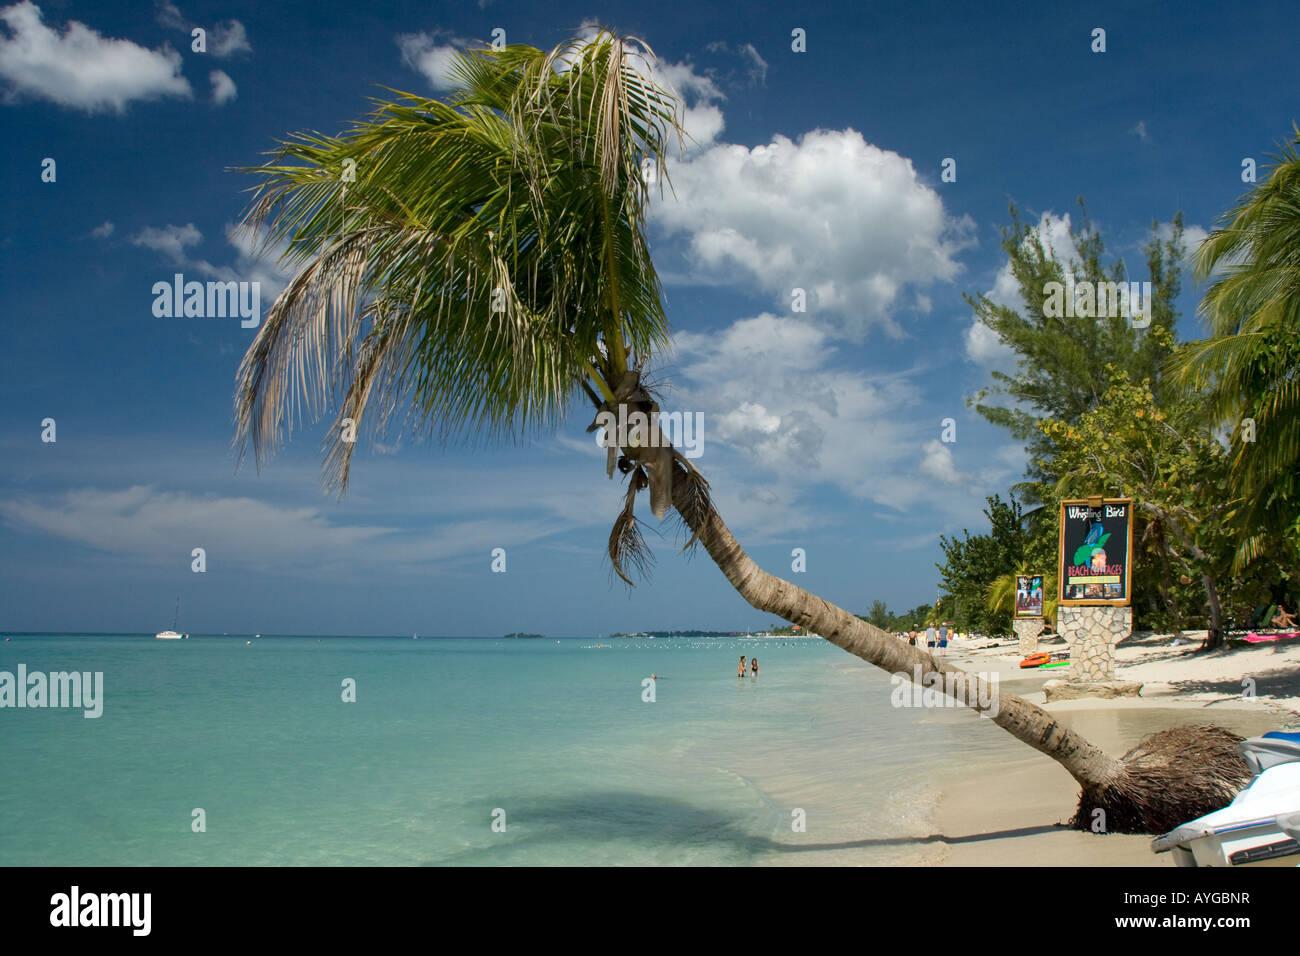 Jamaica Negril beach palm tree Stock Photo